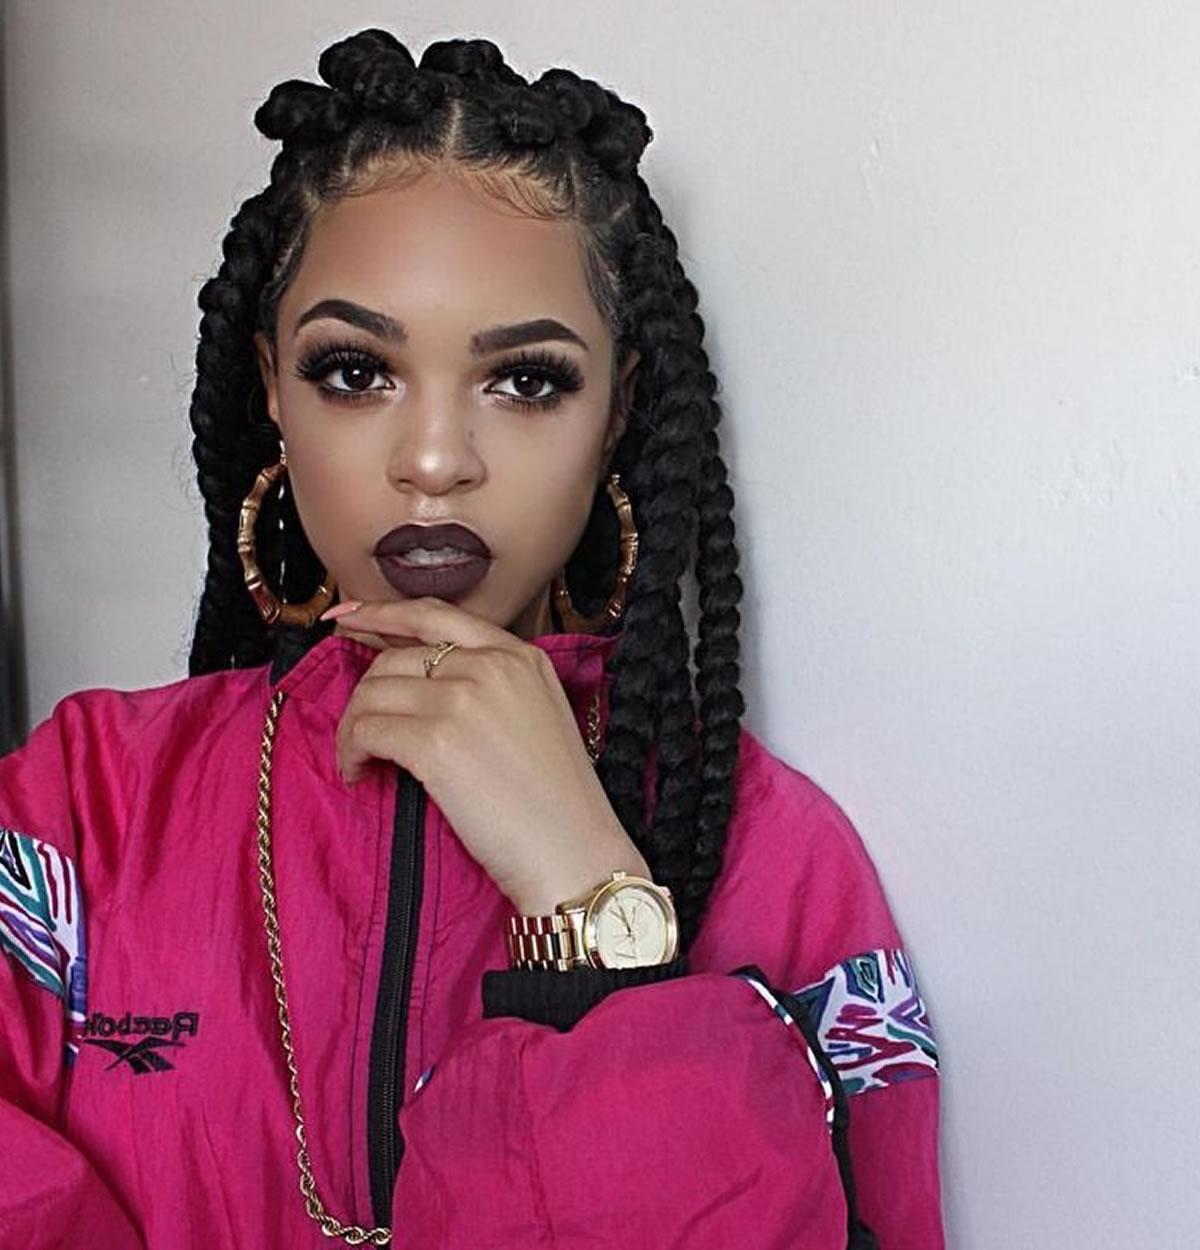 2018 Layered Medium Haircuts For Black Women Regarding Short, Medium And Long Hair Ideas & Hairstyles For Black Women  (View 1 of 20)